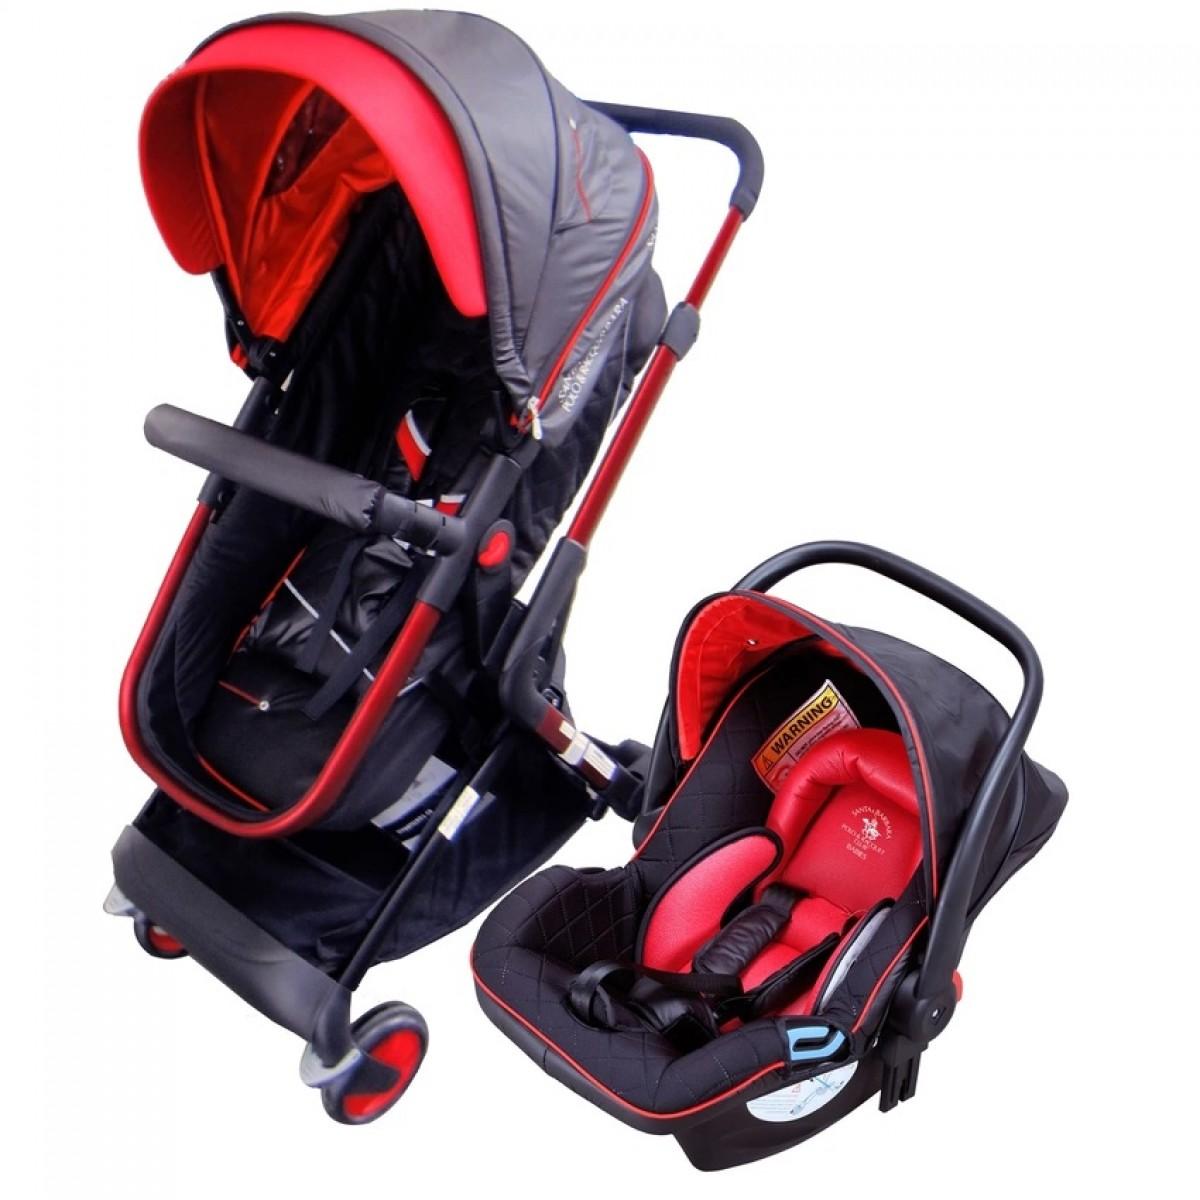 2 IN 1 STROLLER (ST988 + CS29AD) - Kico Baby Center